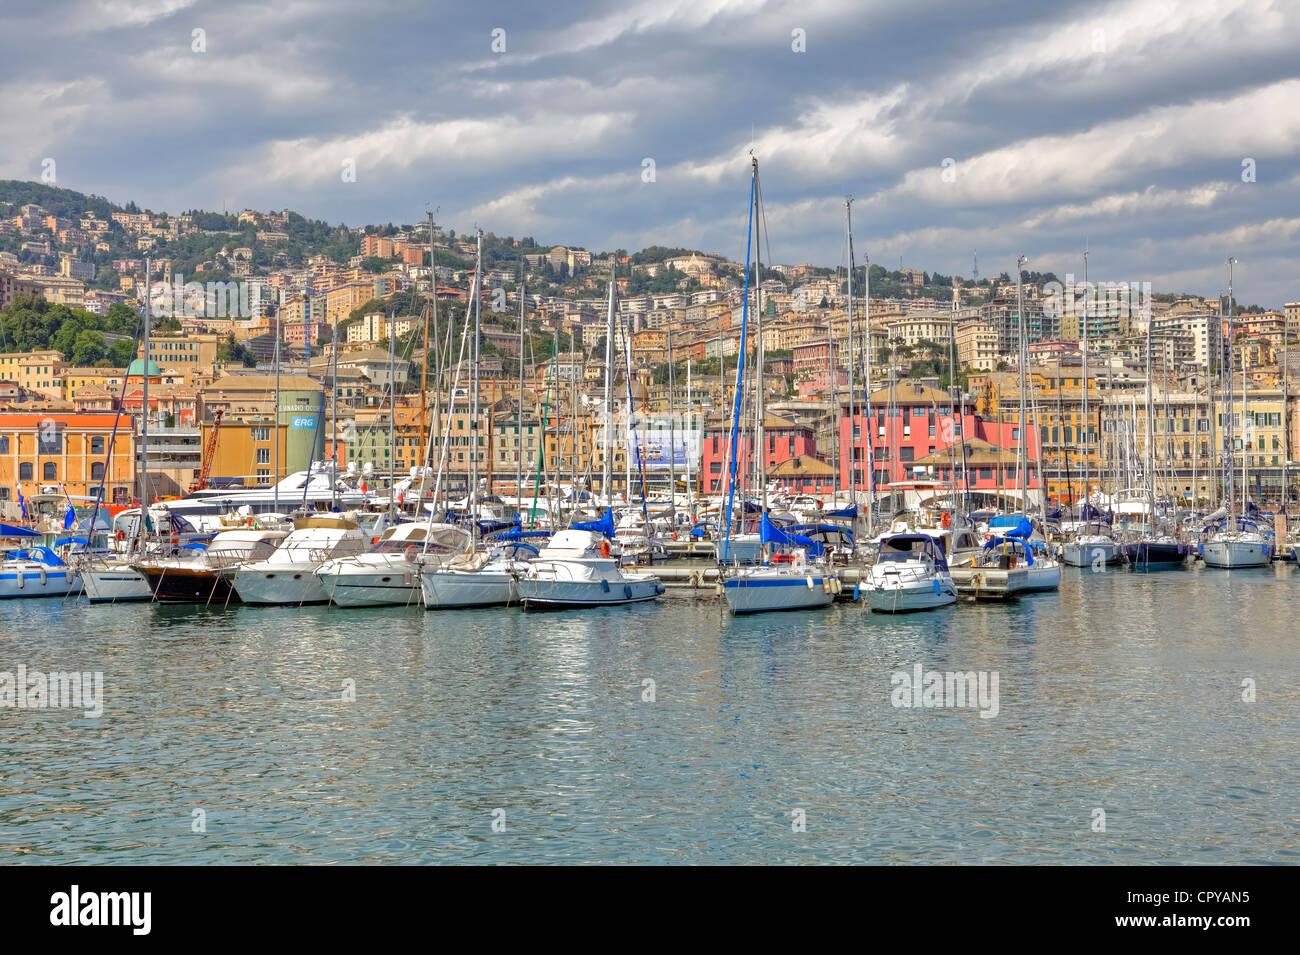 Port of Genoa, Liguria, Italy - Stock Image